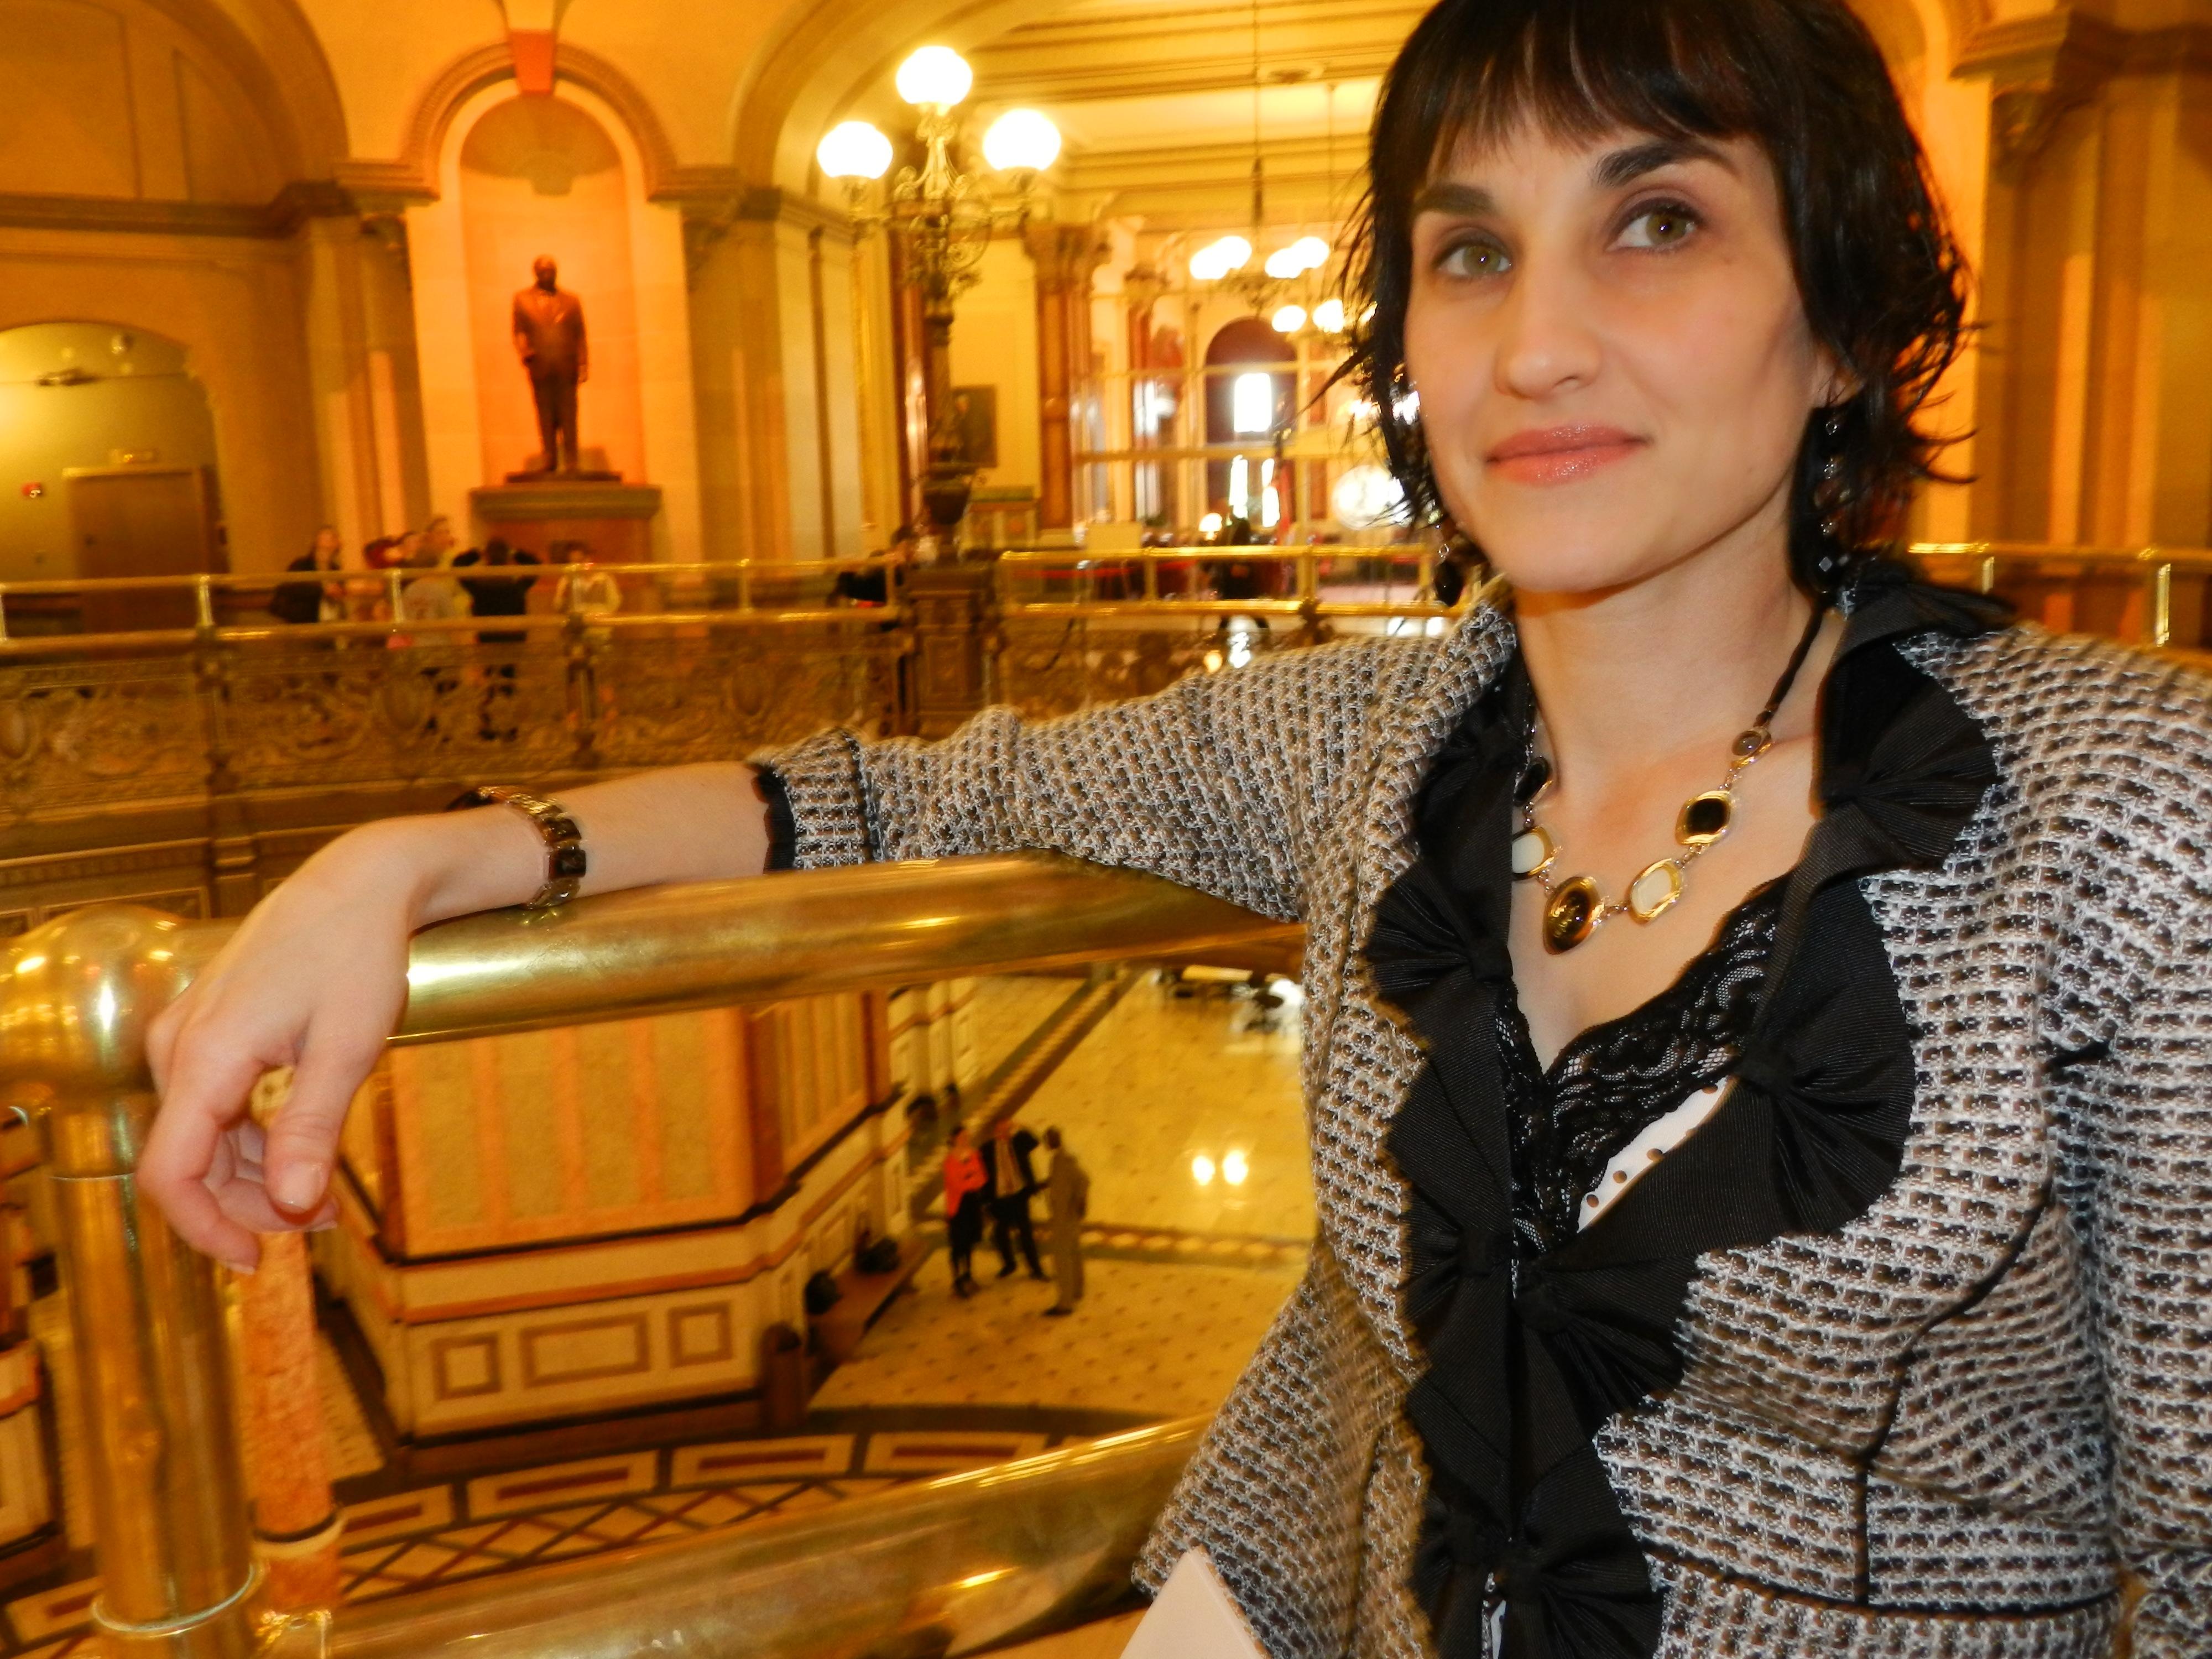 Illinois Alcoholism and Drug Dependence Associaiton CEO Sara Moscato ...